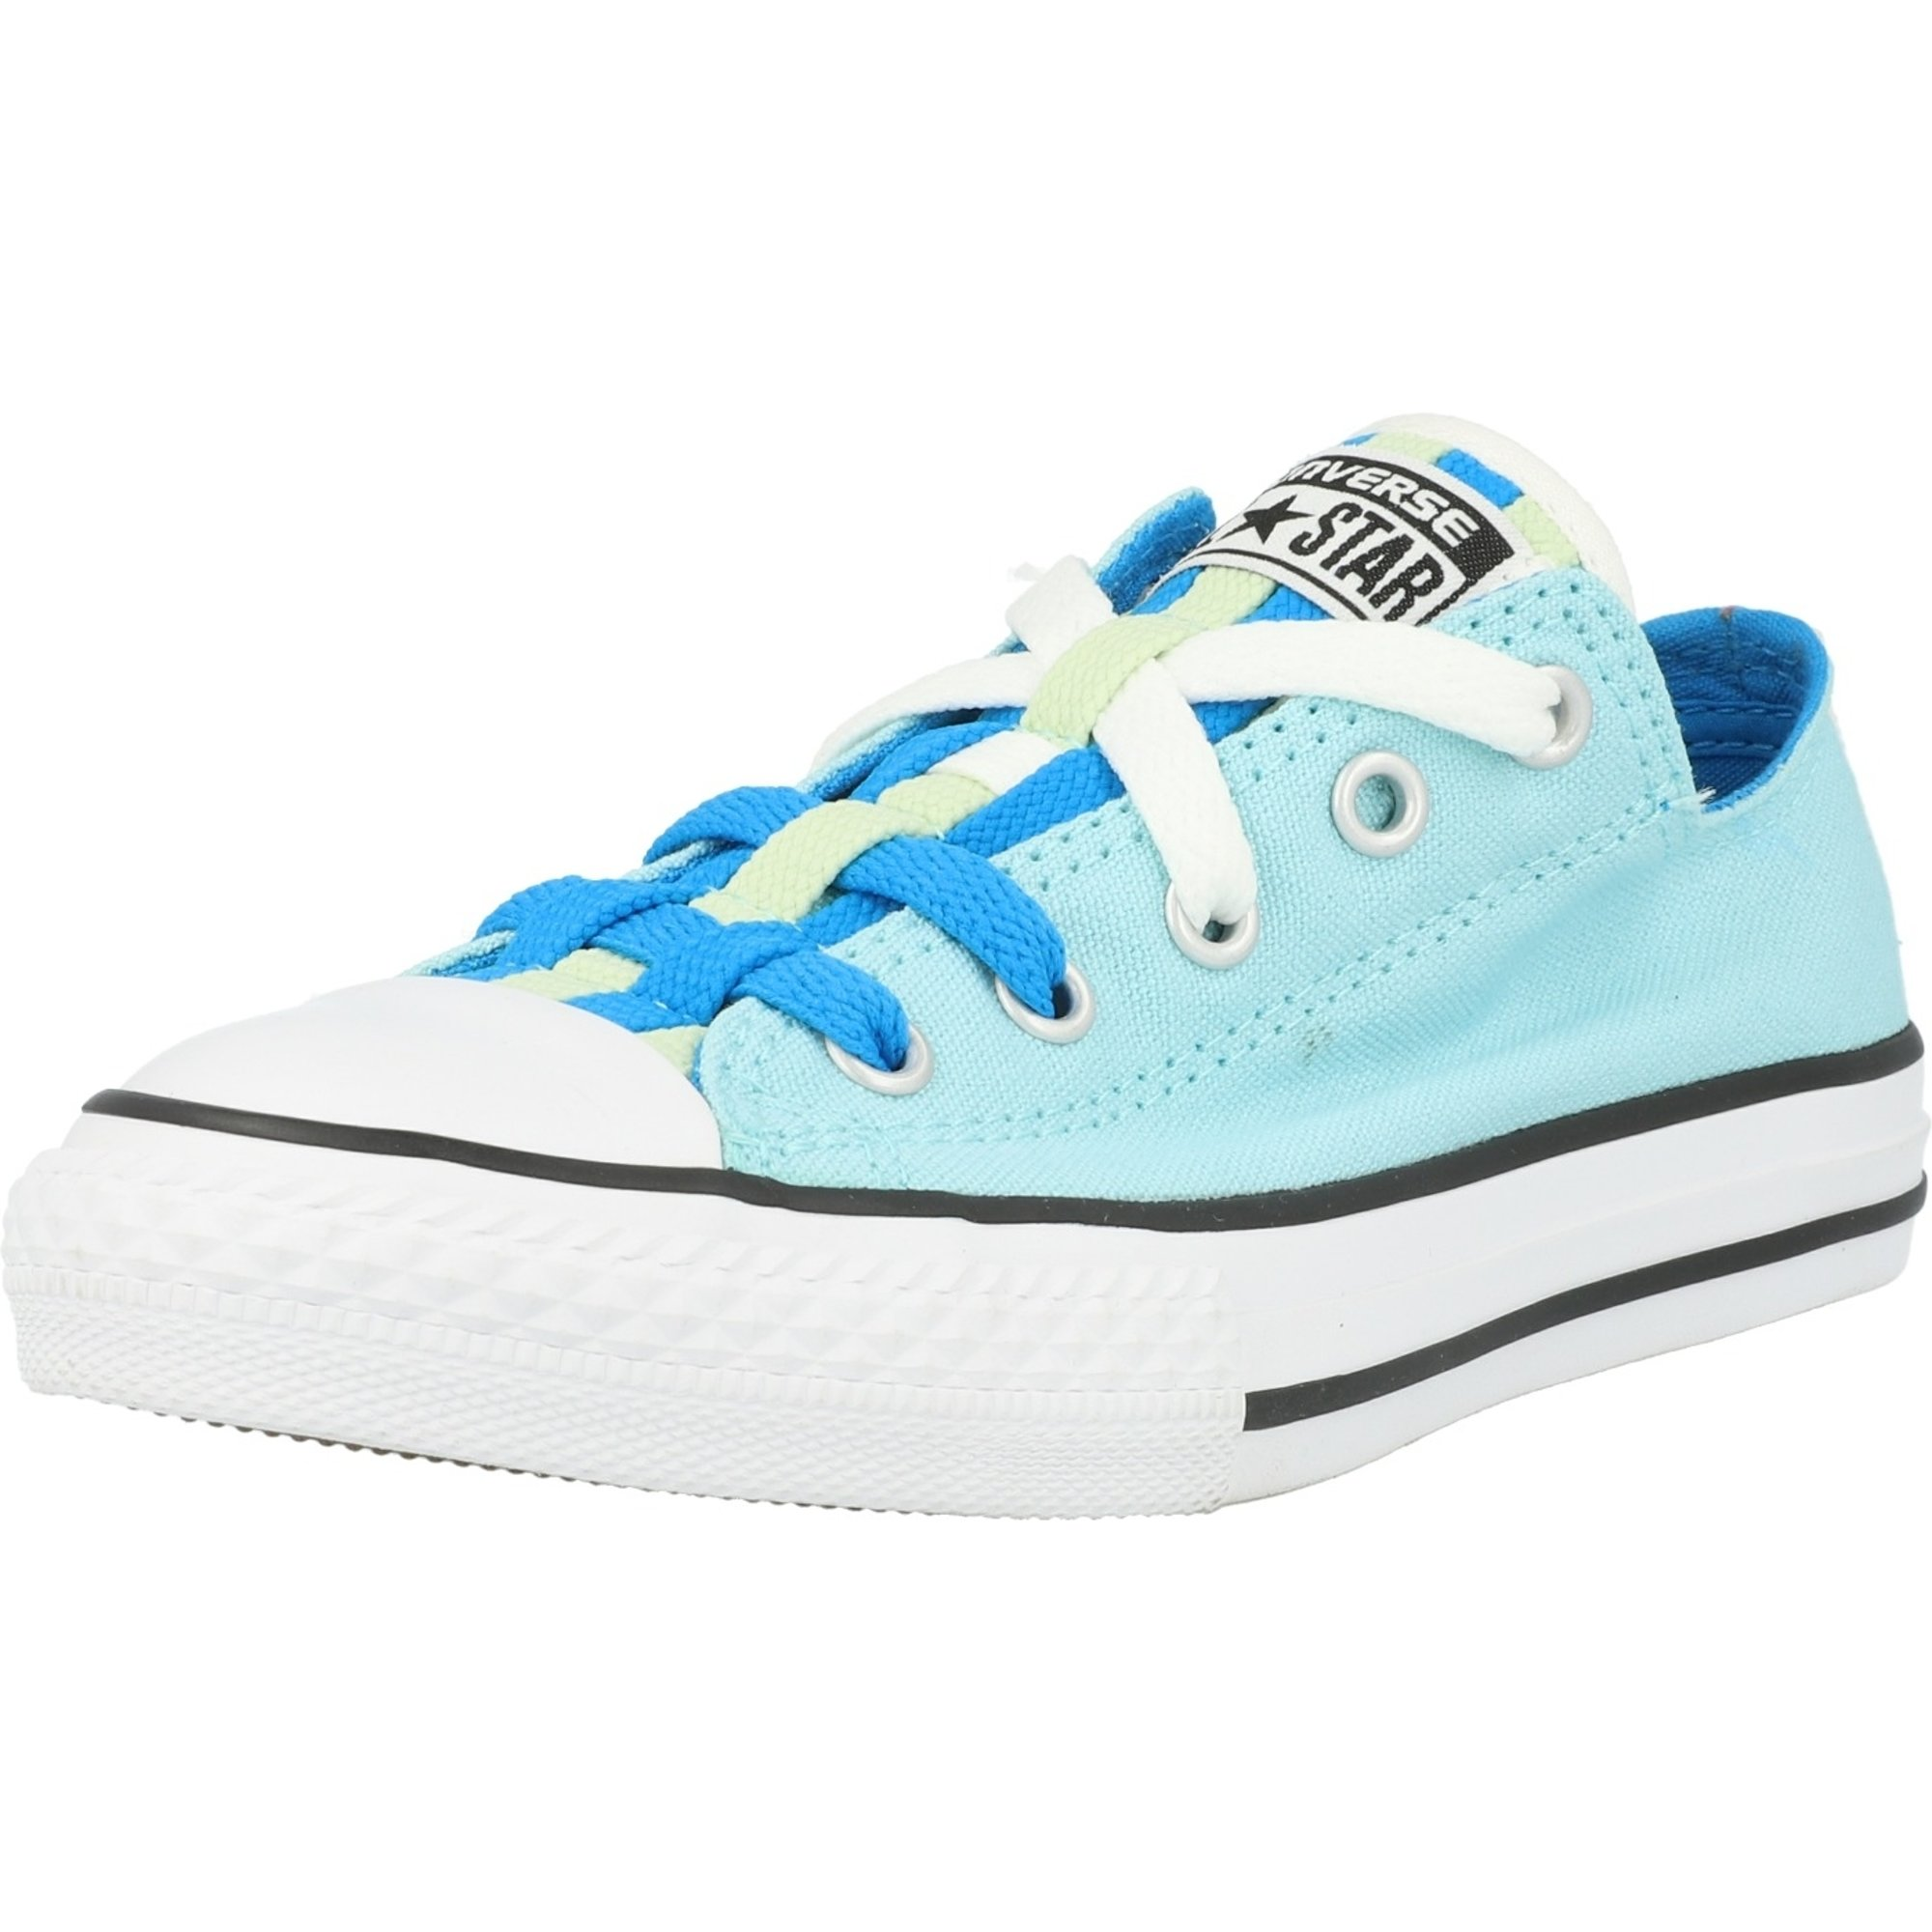 2all star converse azul